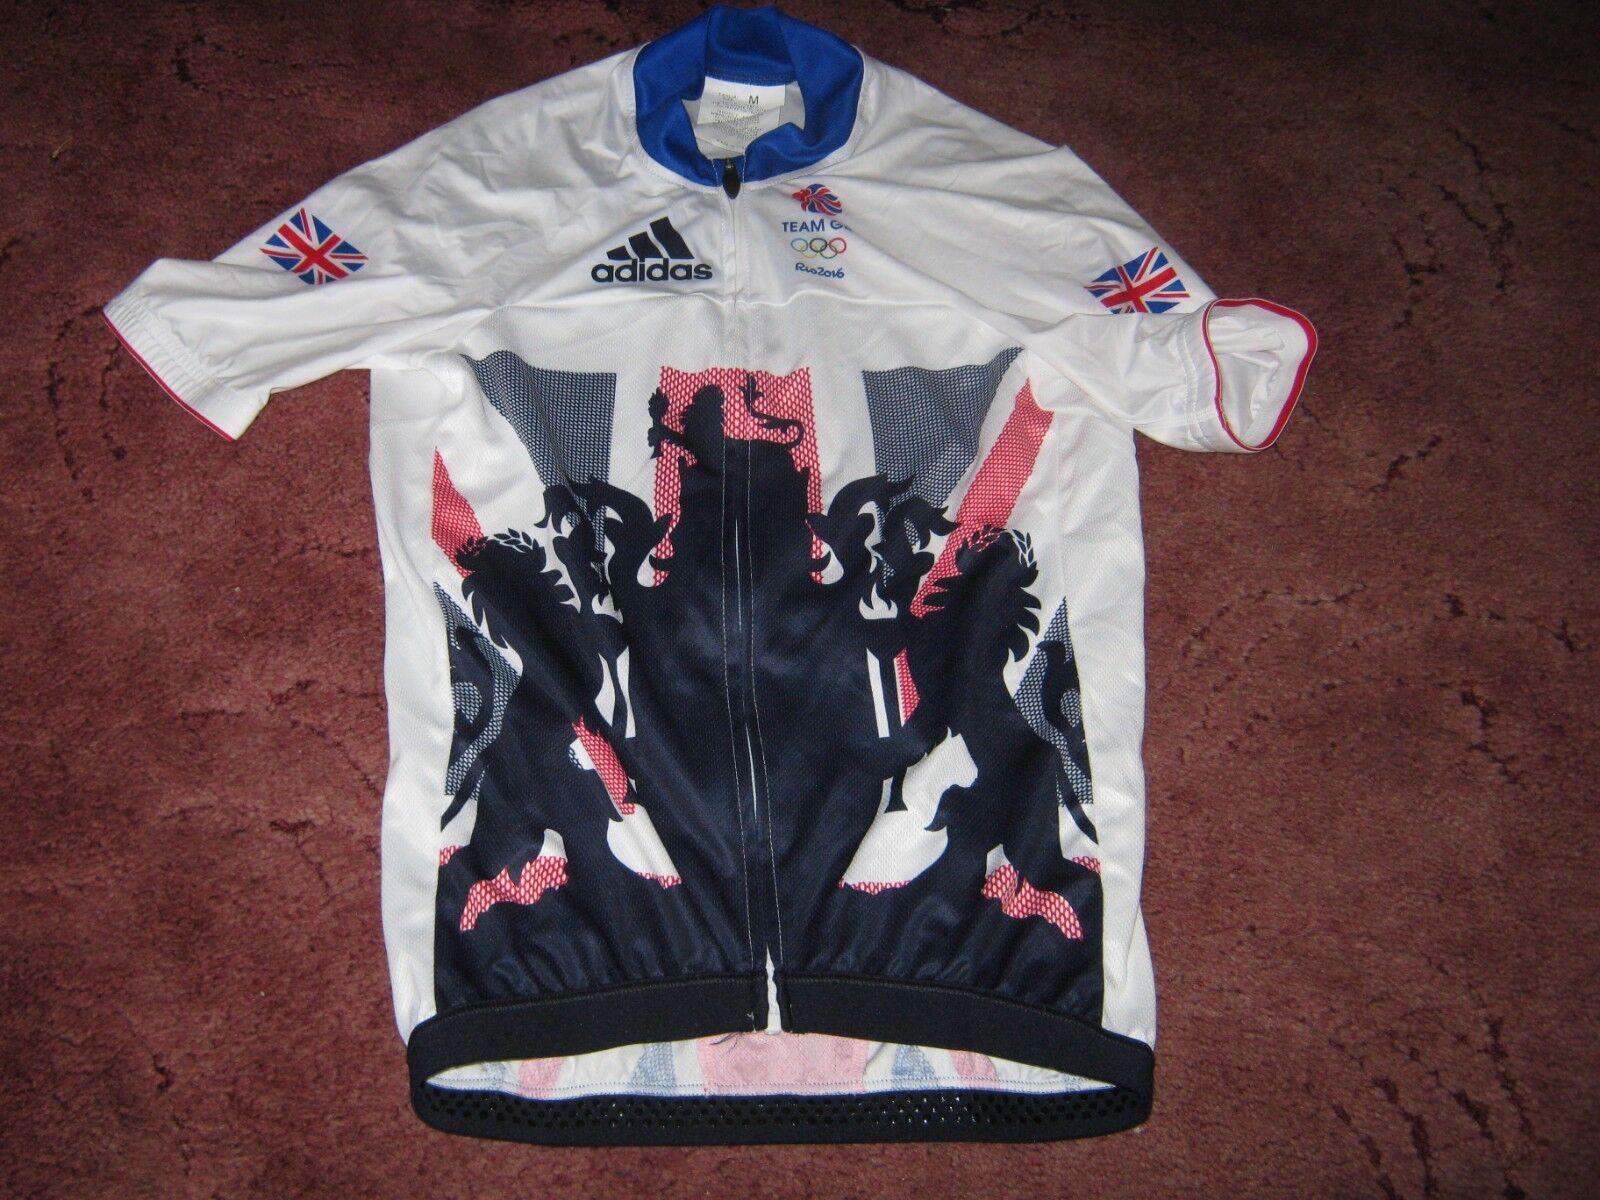 Team GB  Rider ISSUE  Rio Olympics 2016 Adidas AERO Ciclismo Jersey [M]